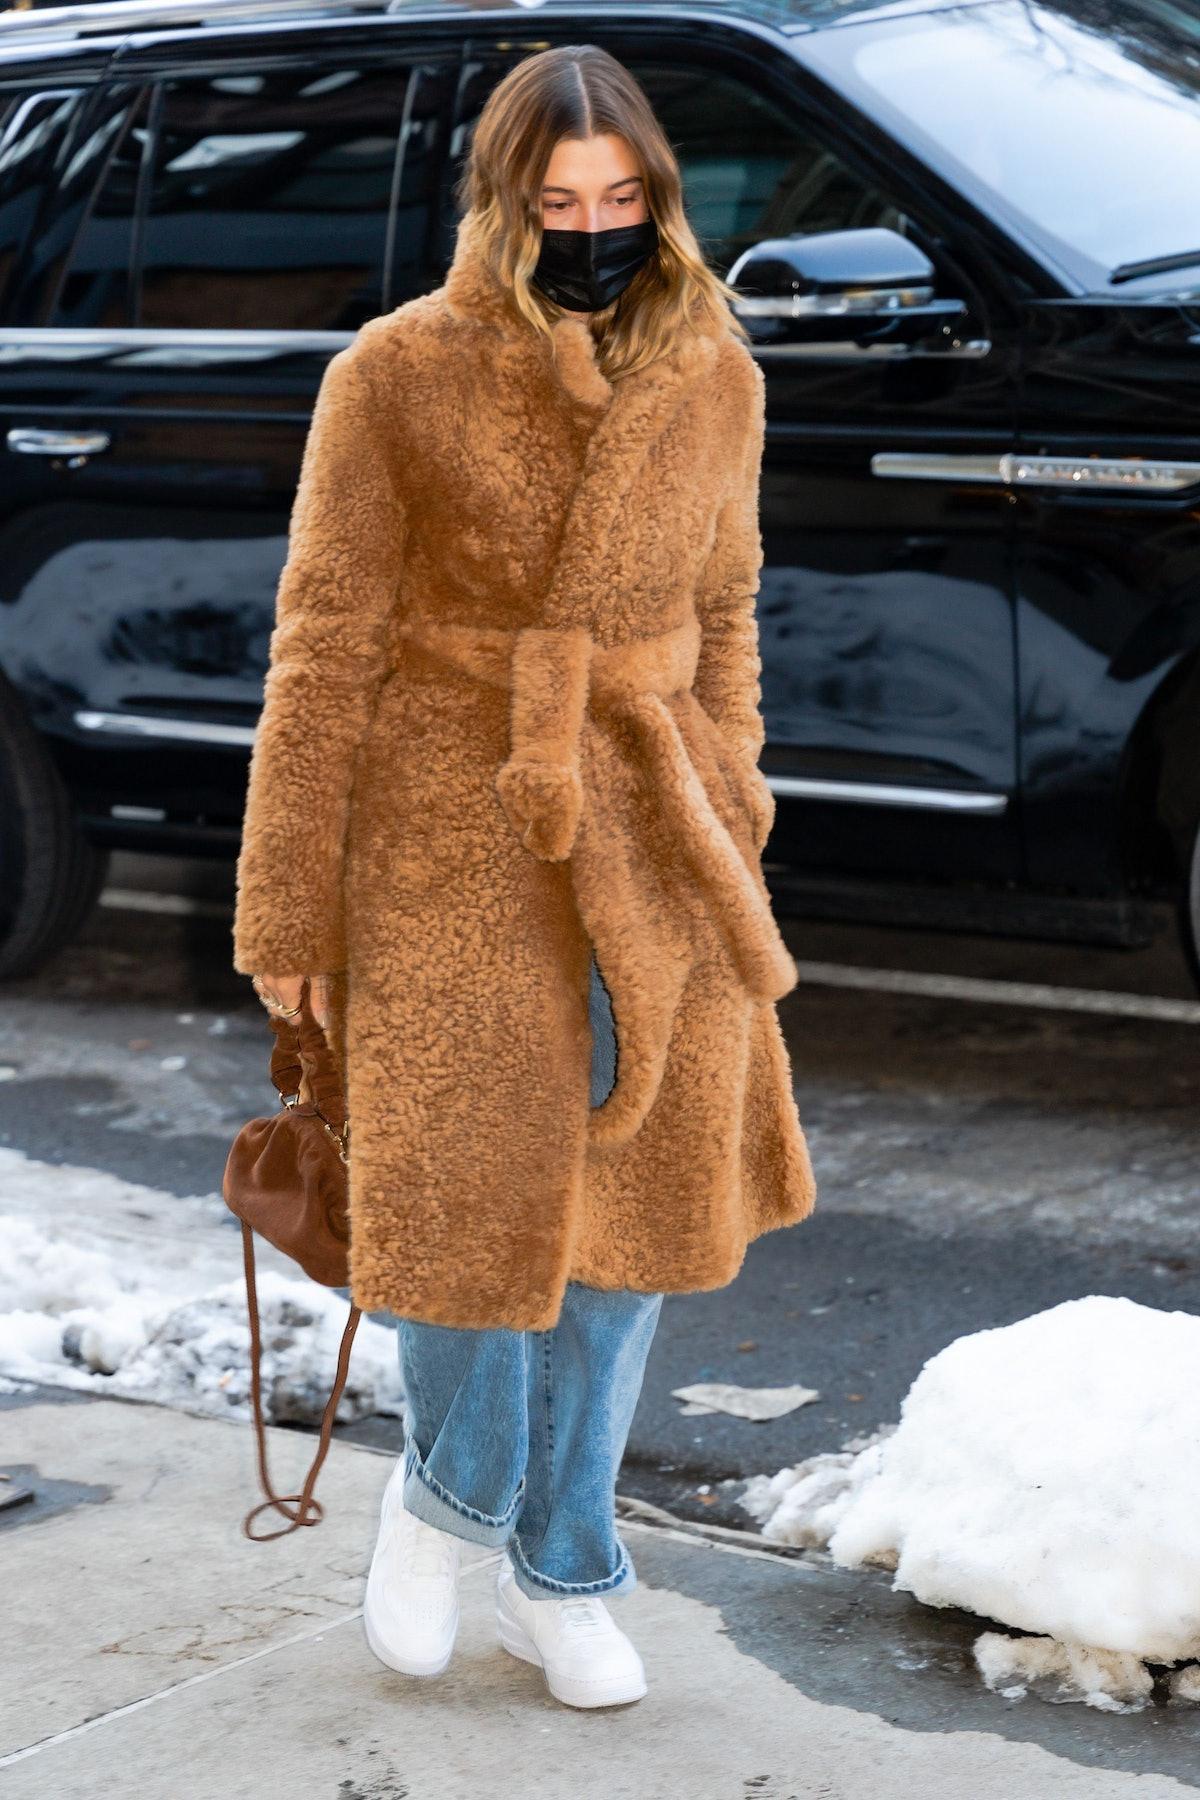 Hailey Bieber is seen in SoHo in New York City in February 2021.